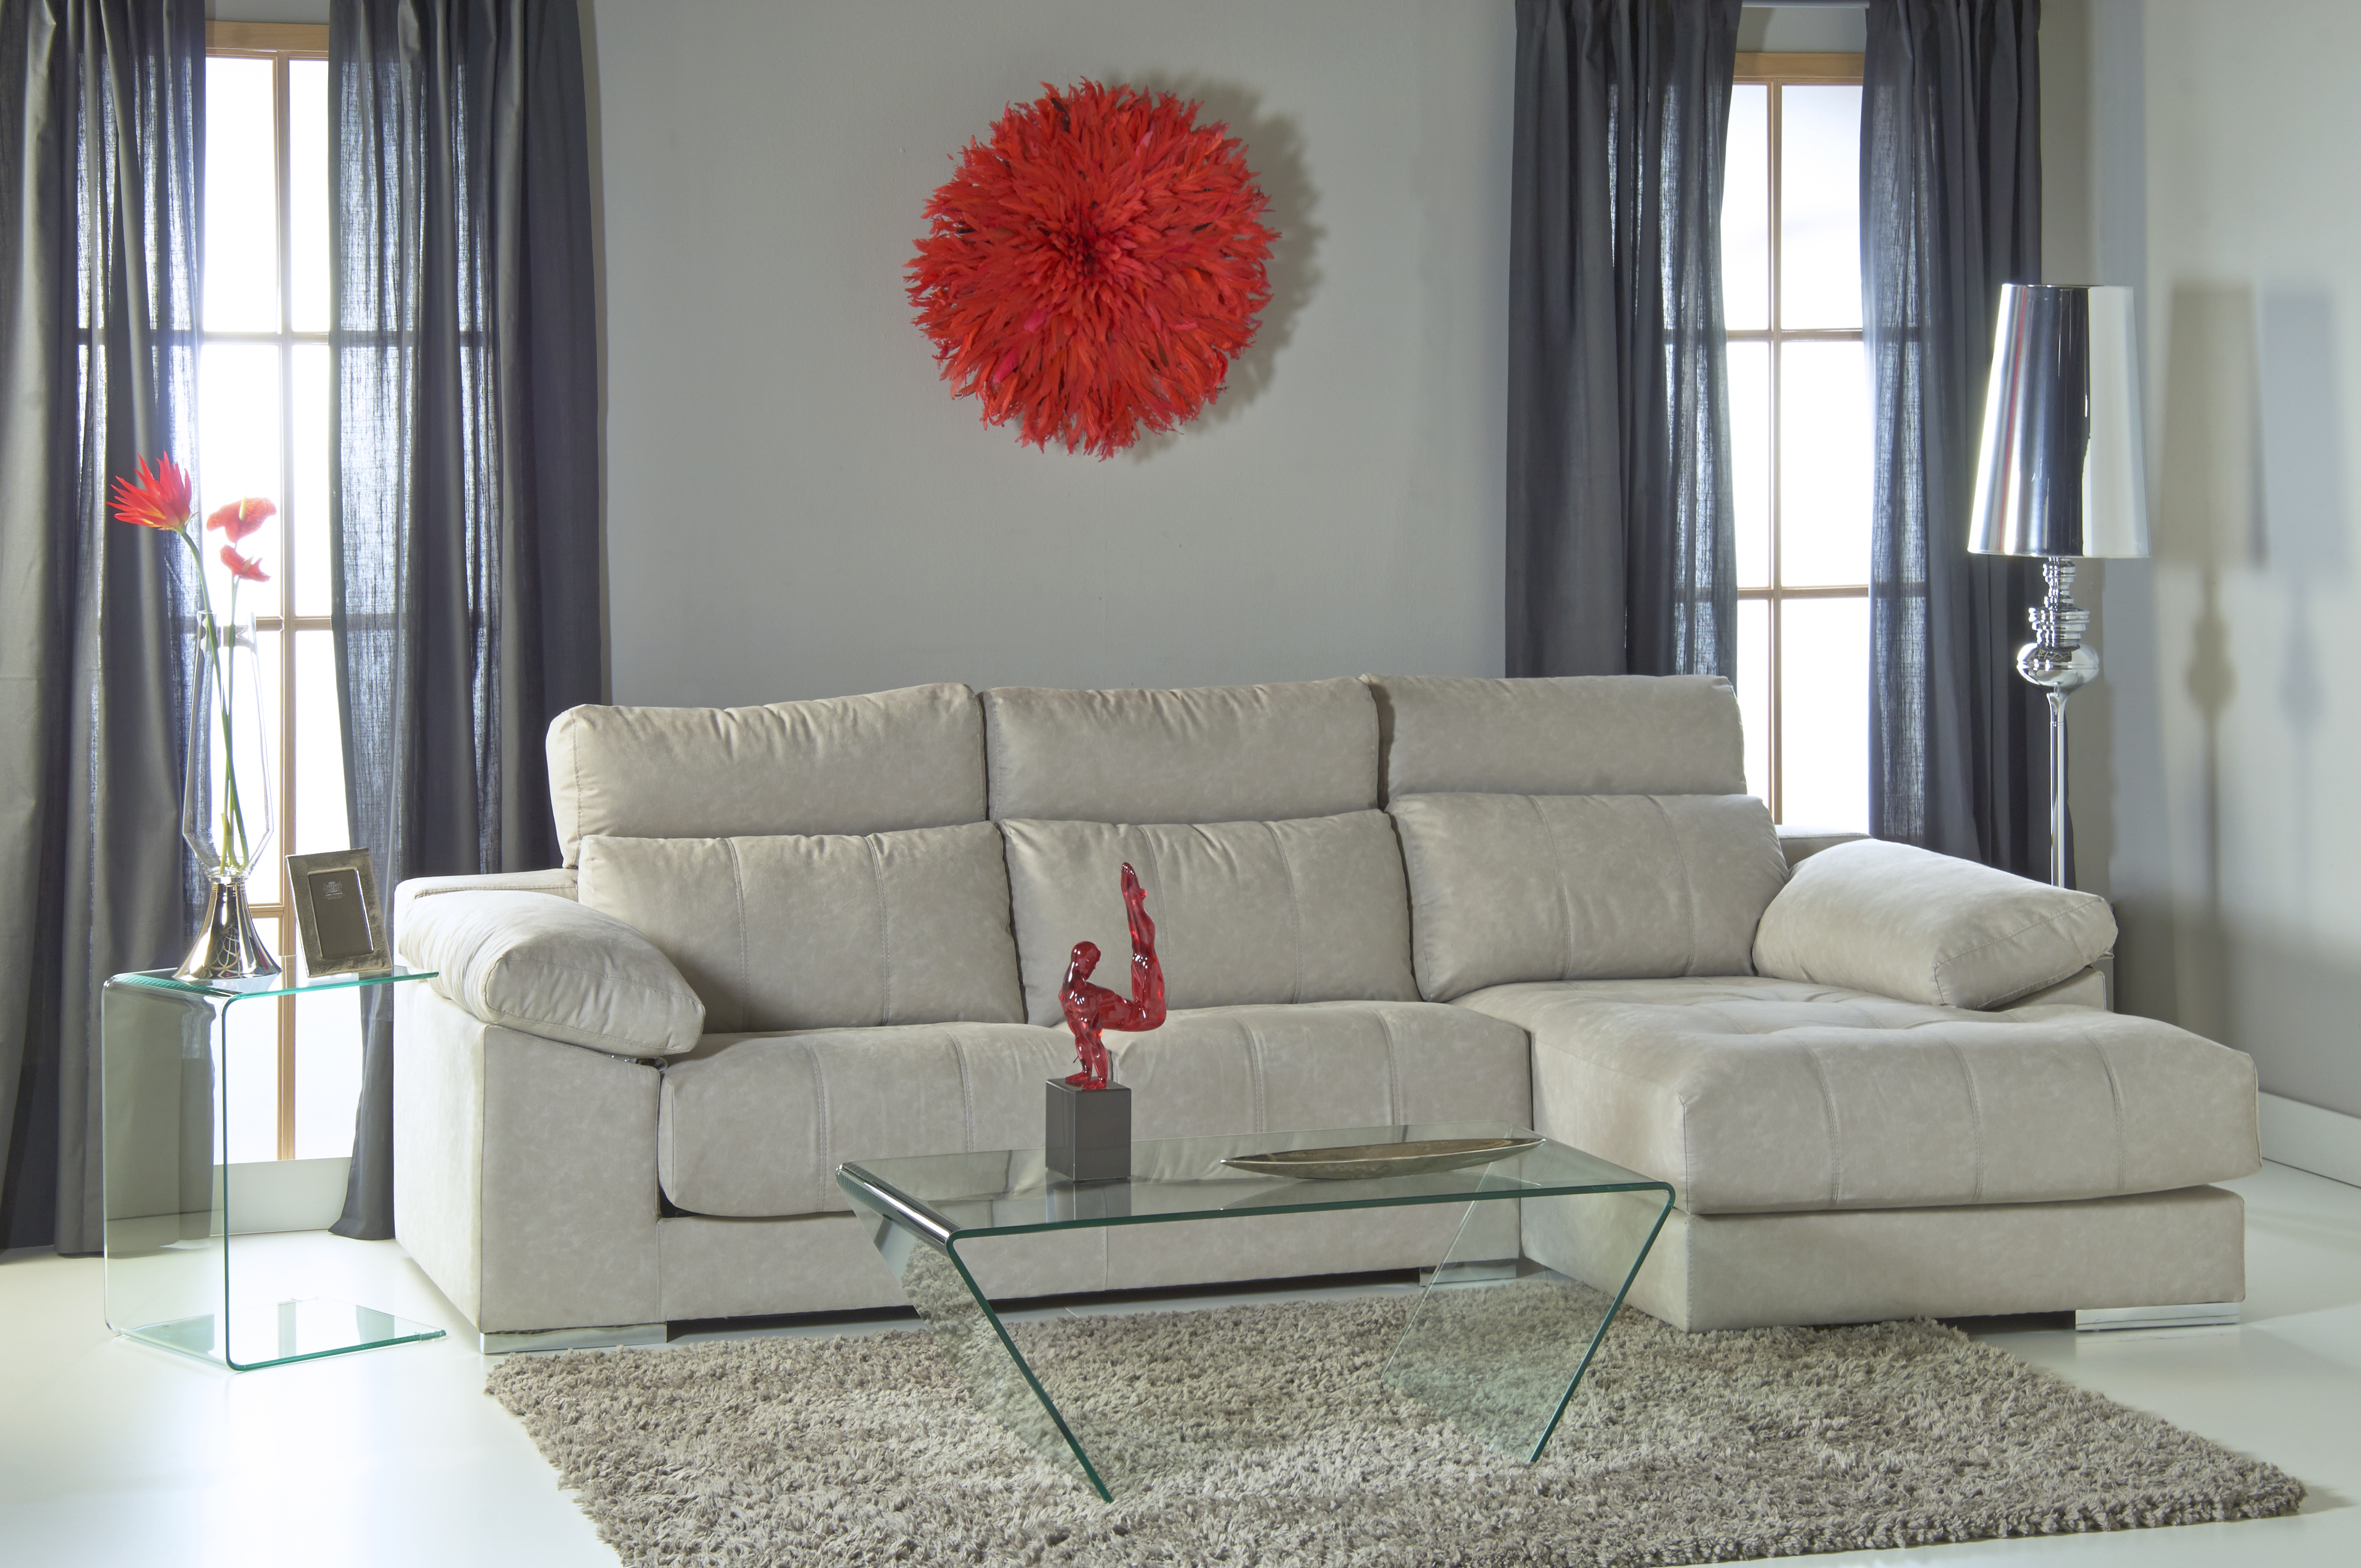 Ventajas de un sofá chaiselongue